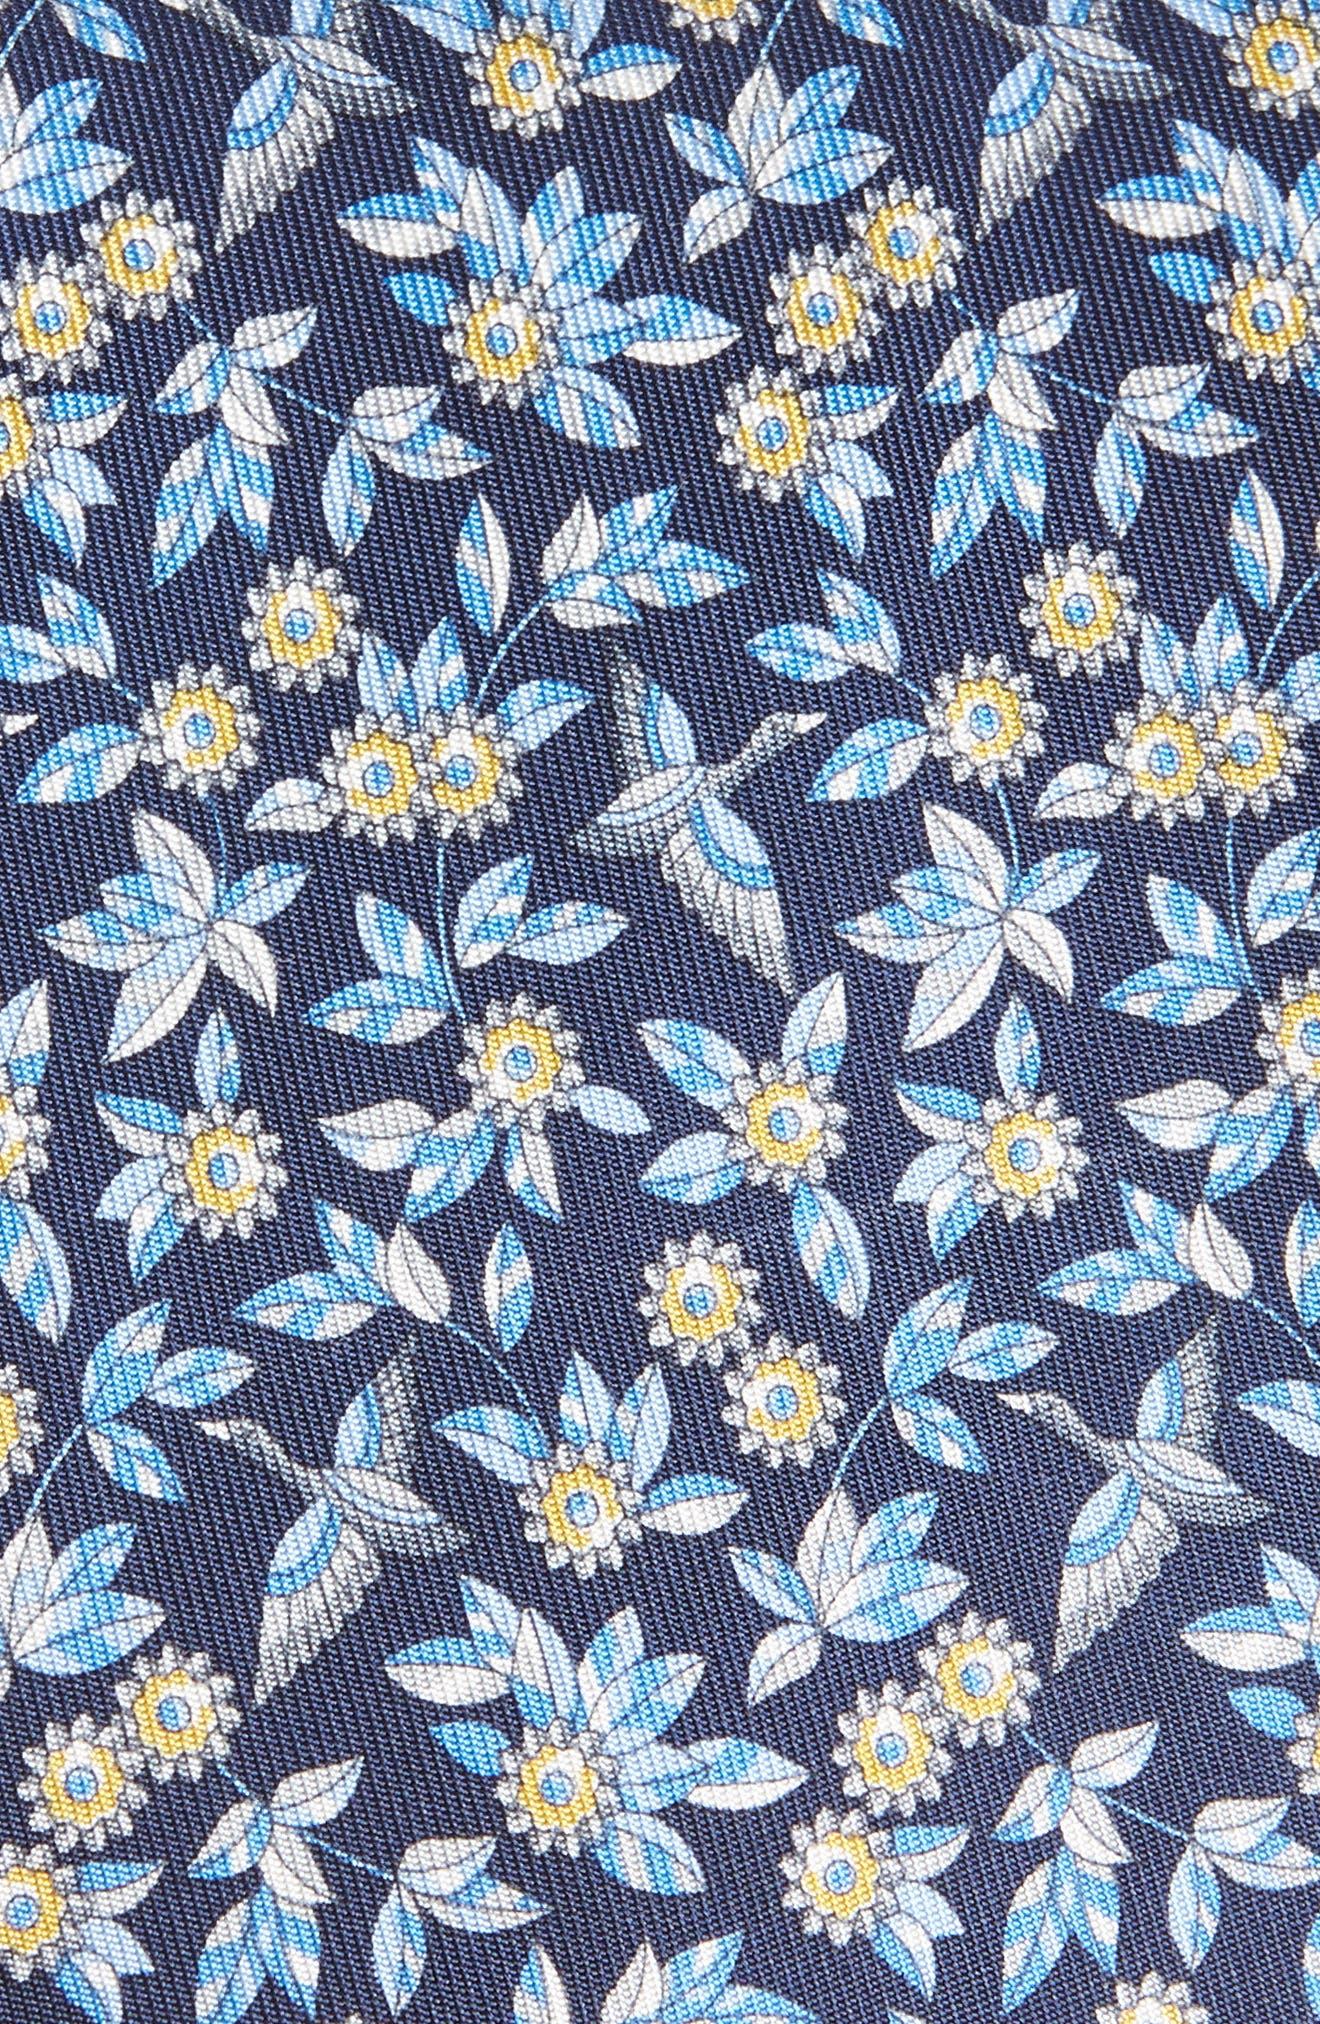 Floral Print Silk Tie,                             Alternate thumbnail 2, color,                             NAVY